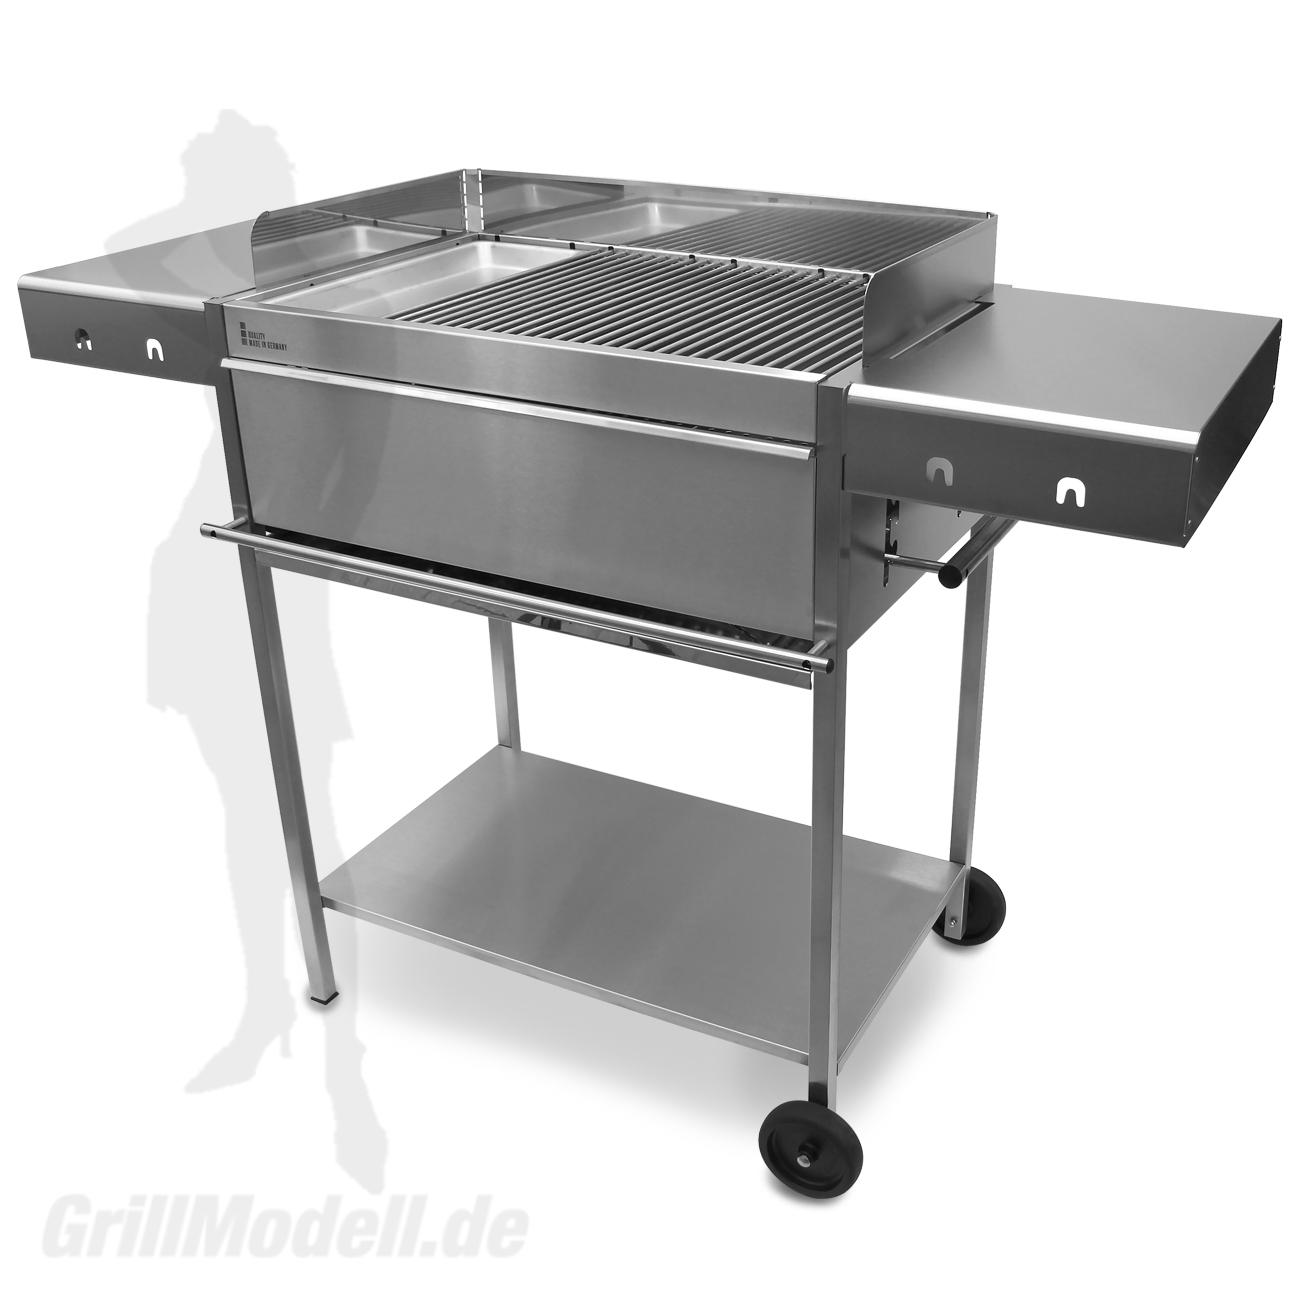 Holzkohlegrill Edelstahlgrill Edelstar XL Gourmet komplett aus Edelstahl